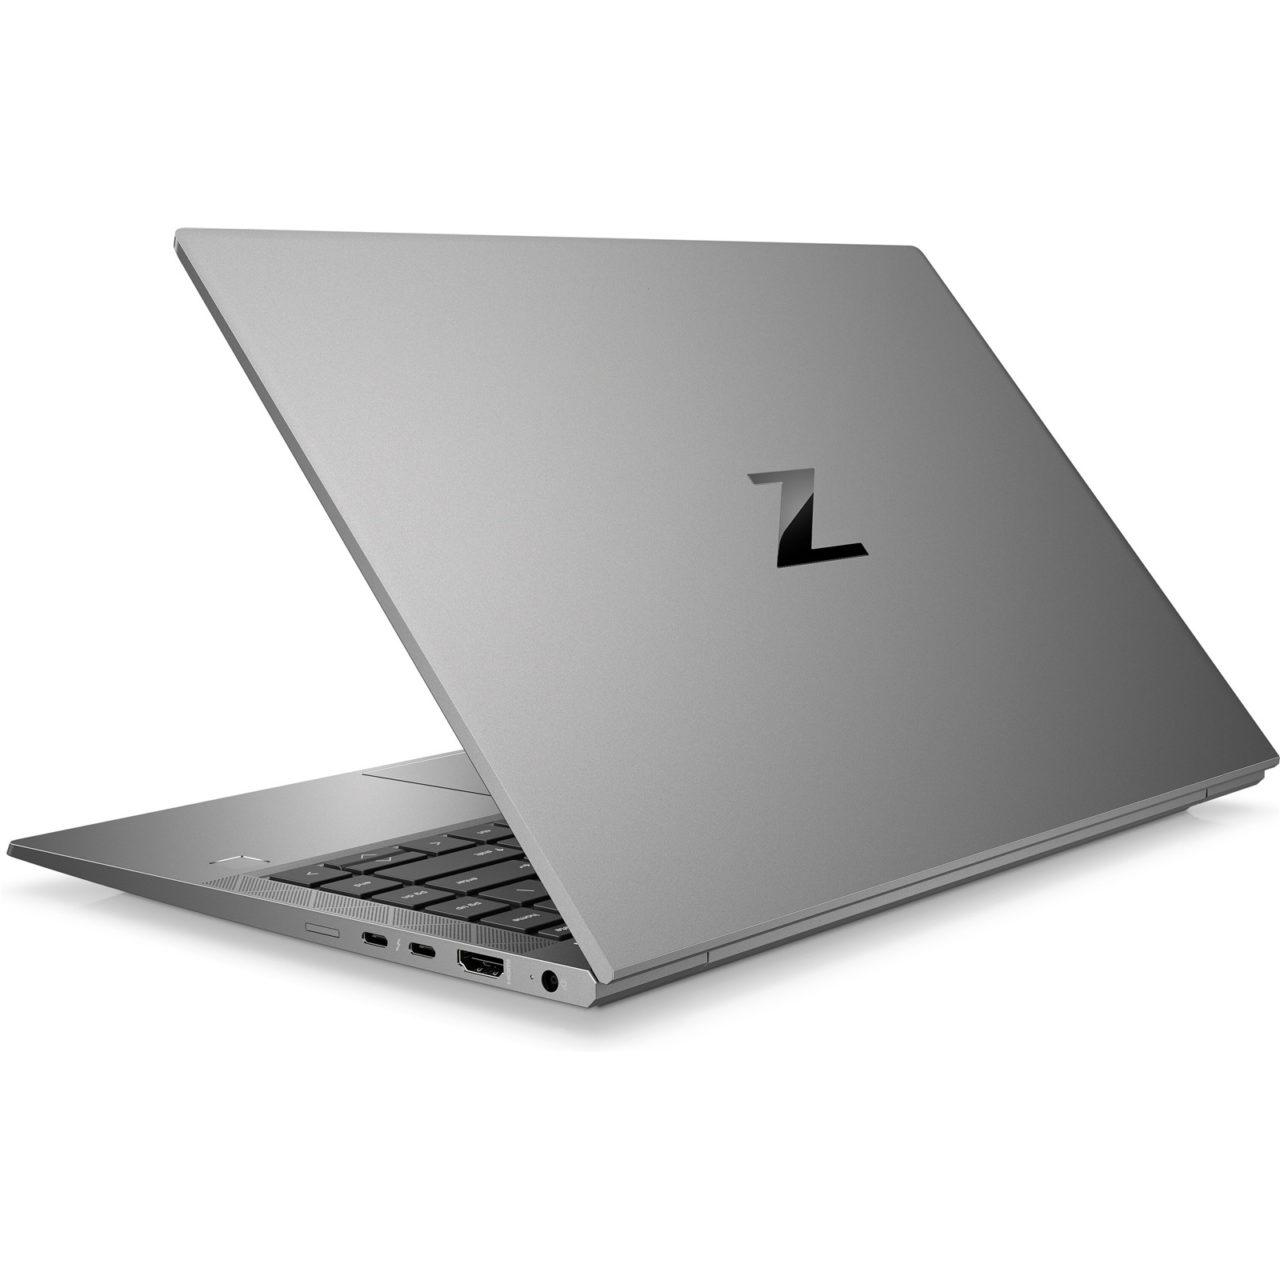 HP Zbook Firefly 14 G8